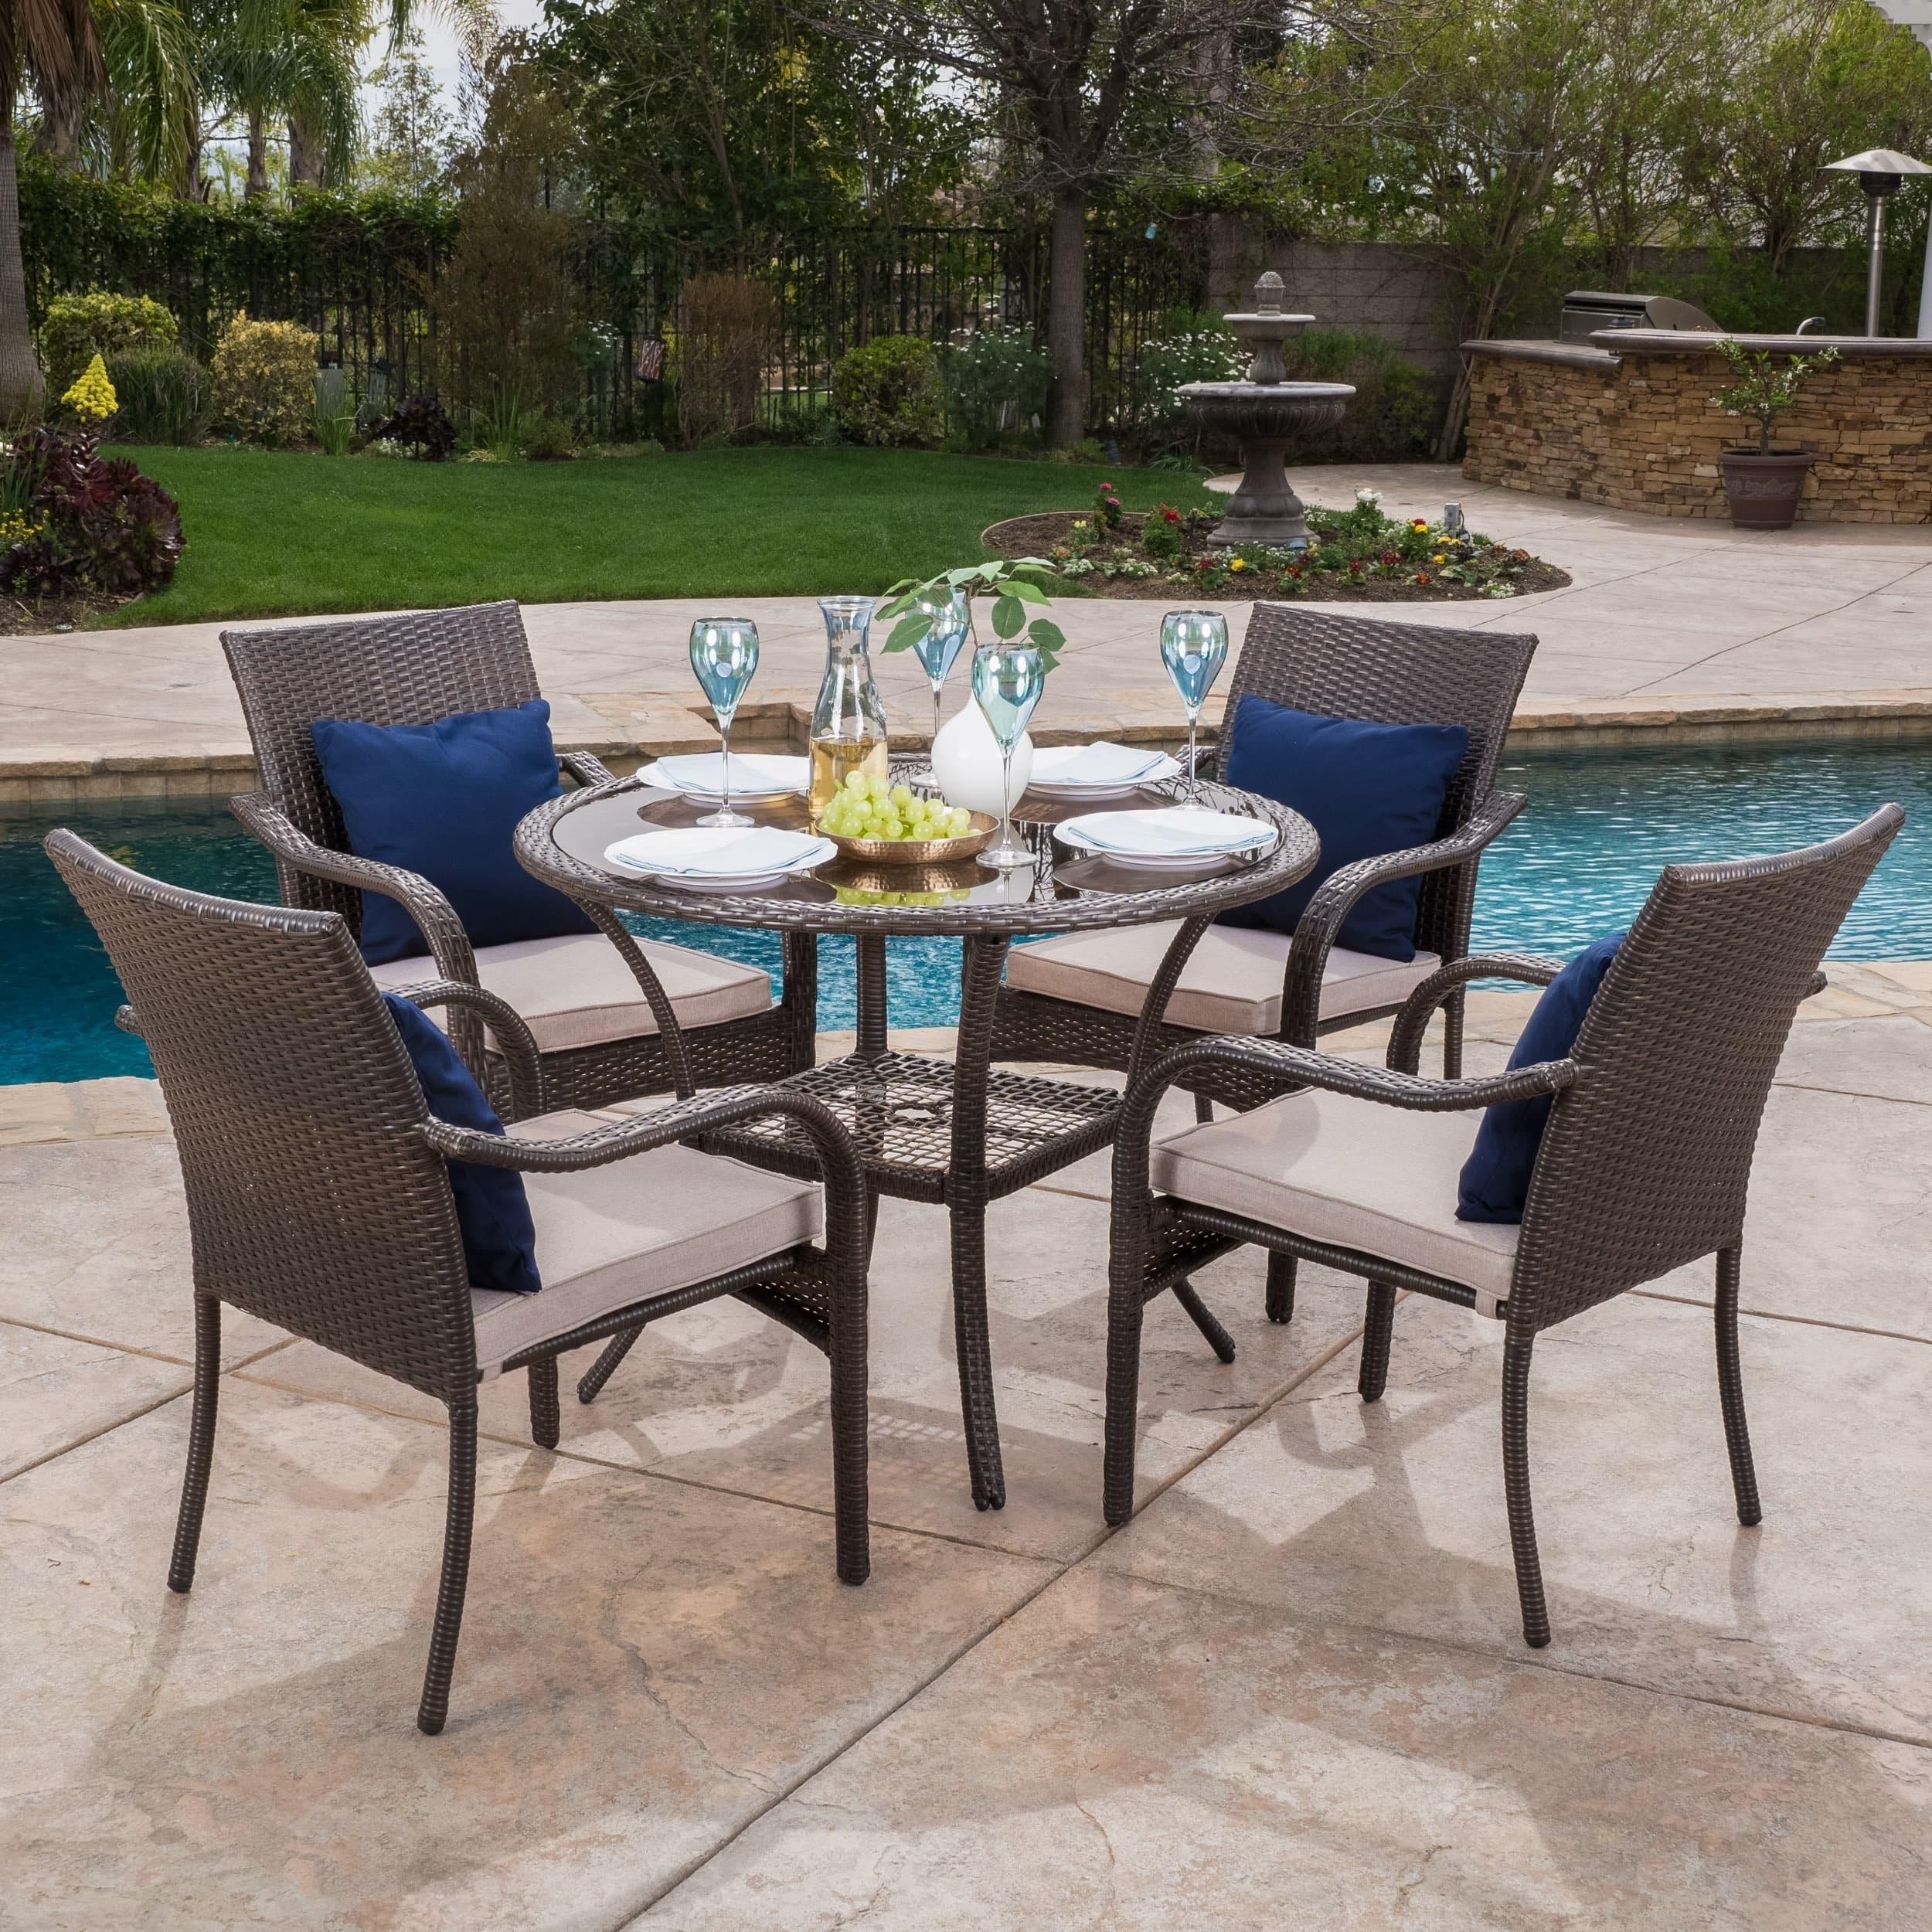 Best Deal Home Furniture: Buy Outdoor Dining Sets Online At Overstock.com